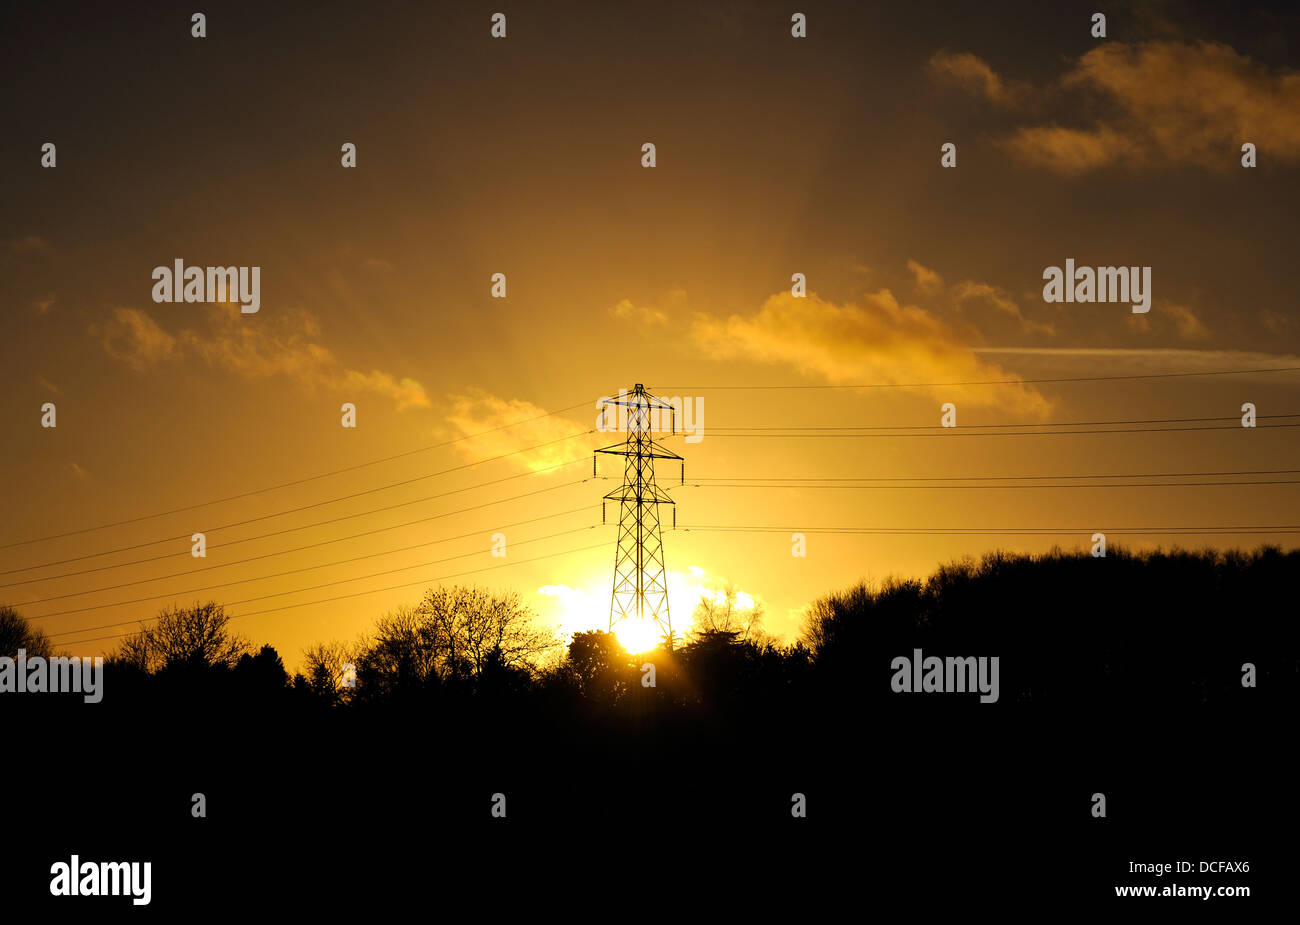 SETTING SUN BEHIND ELECTRICITY PYLON SOLAR POWER - Stock Image